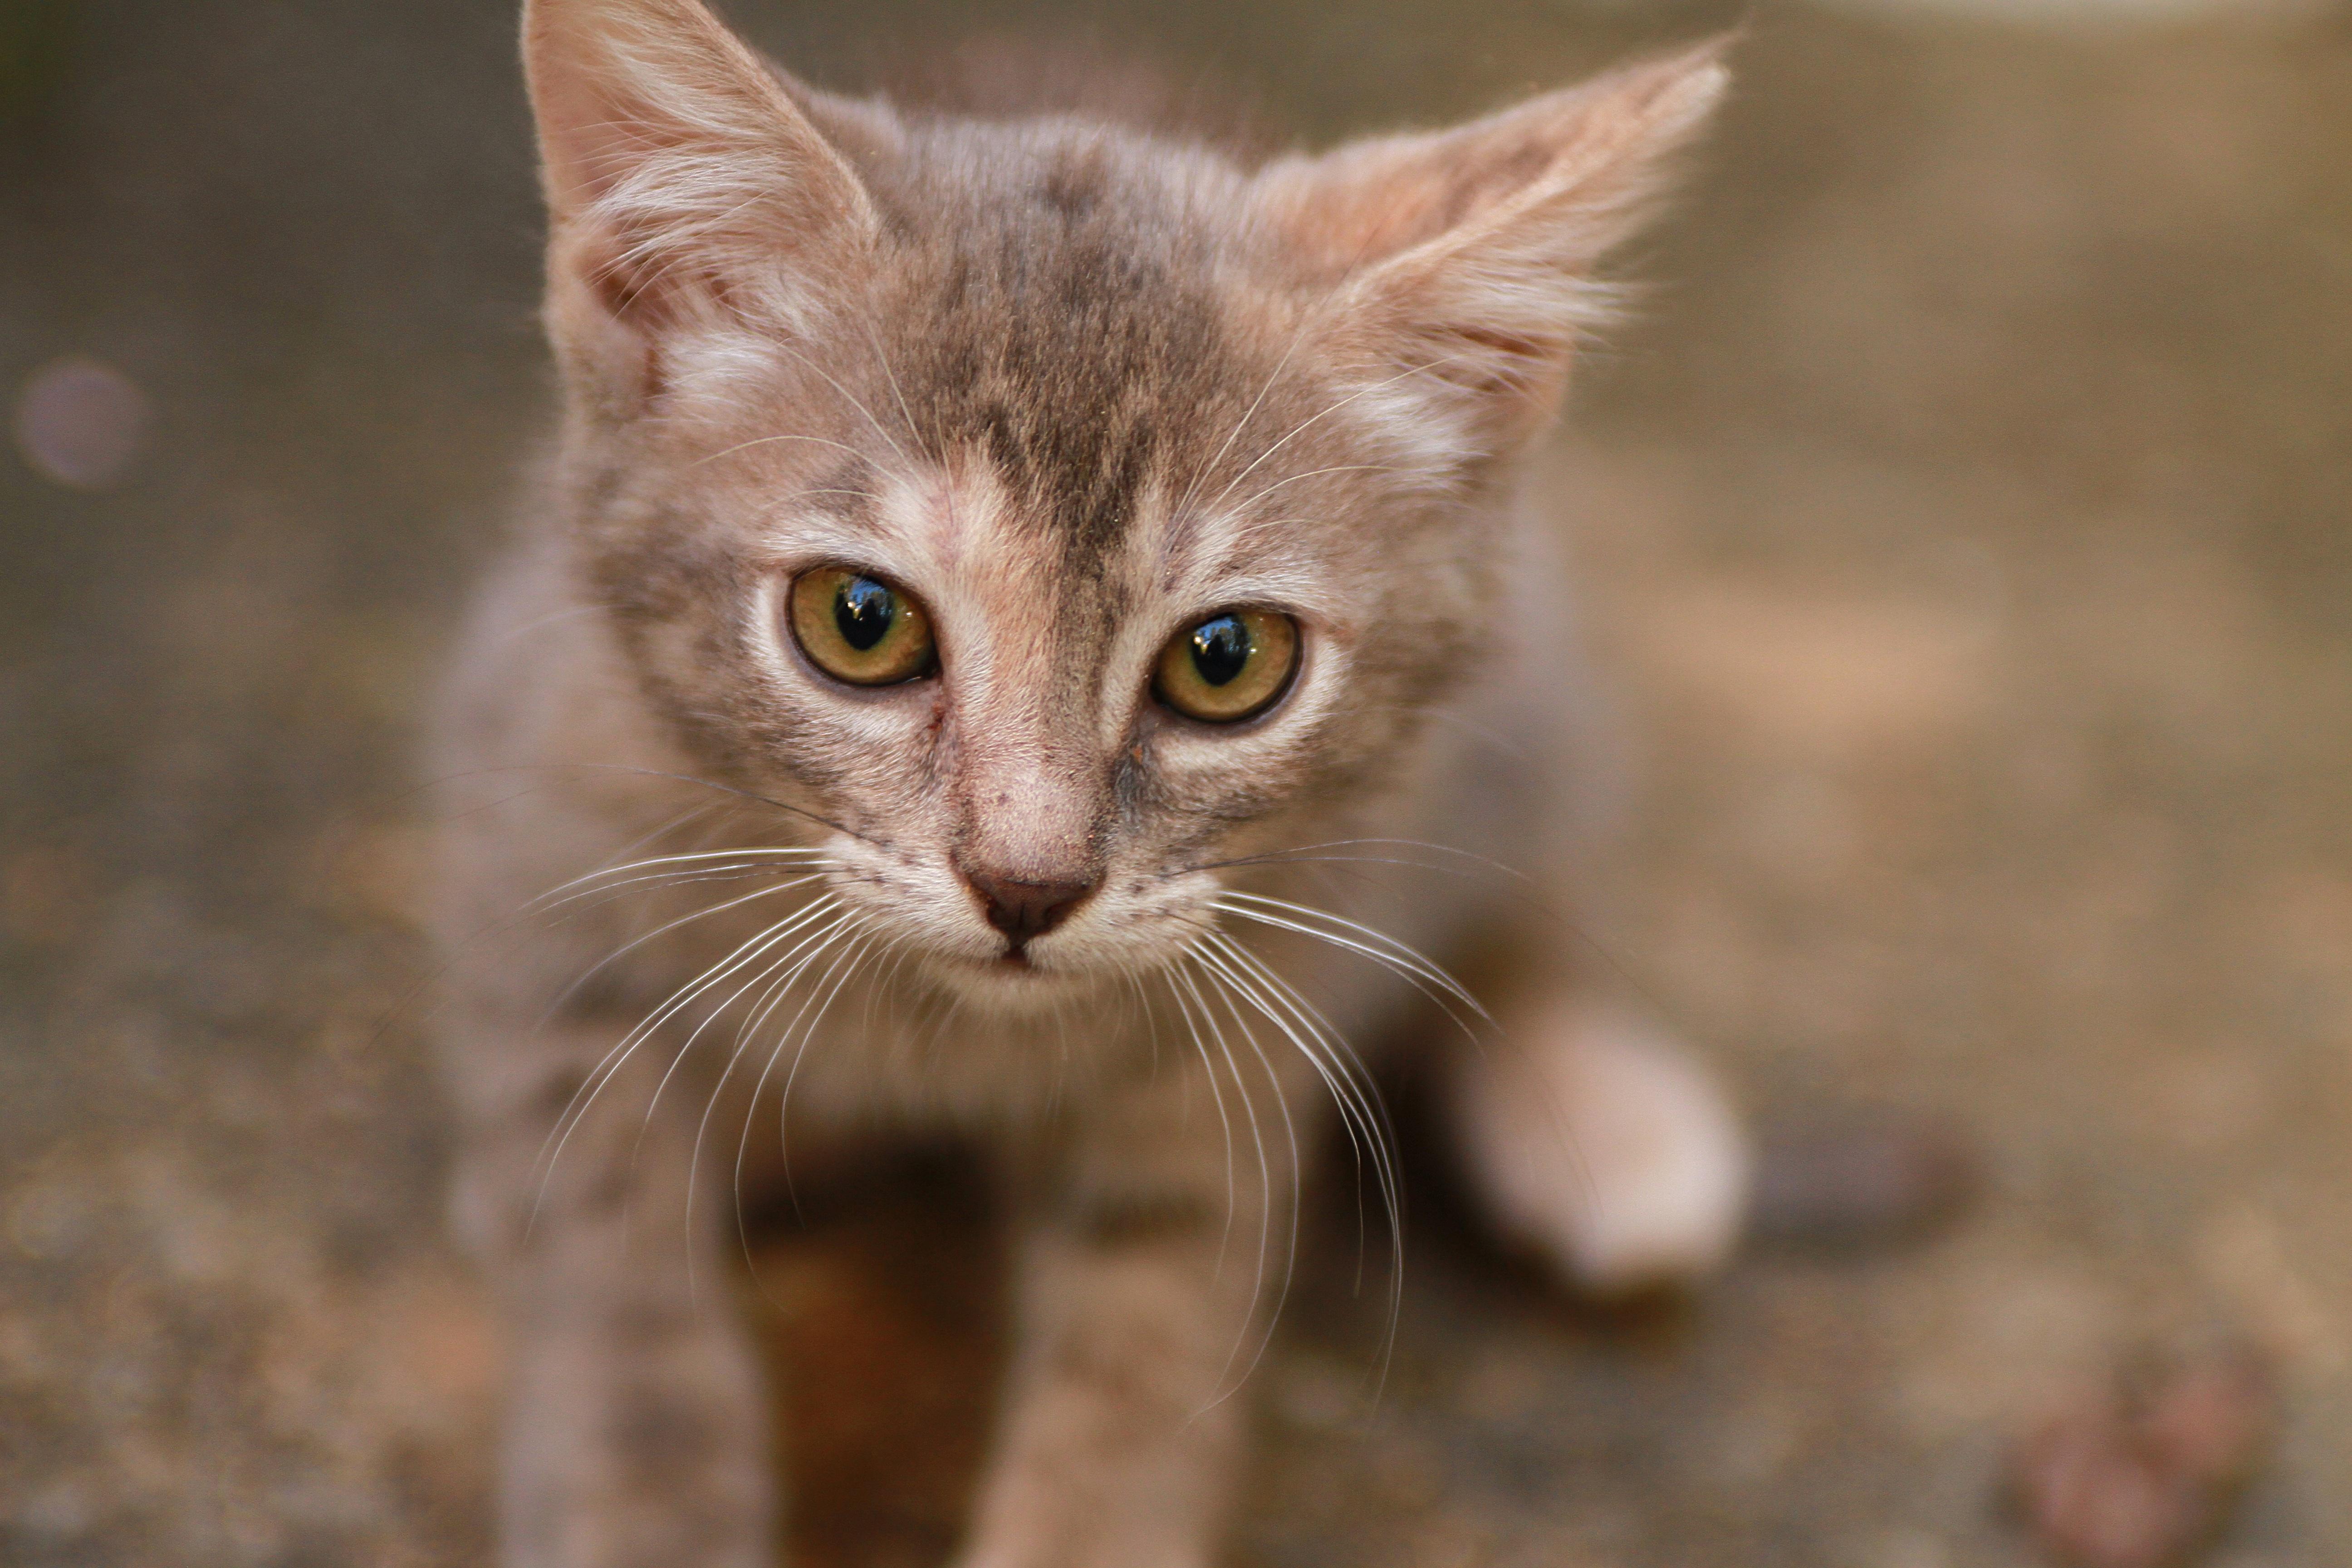 Kitten, Animal, Cat, Friend, Loyal, HQ Photo